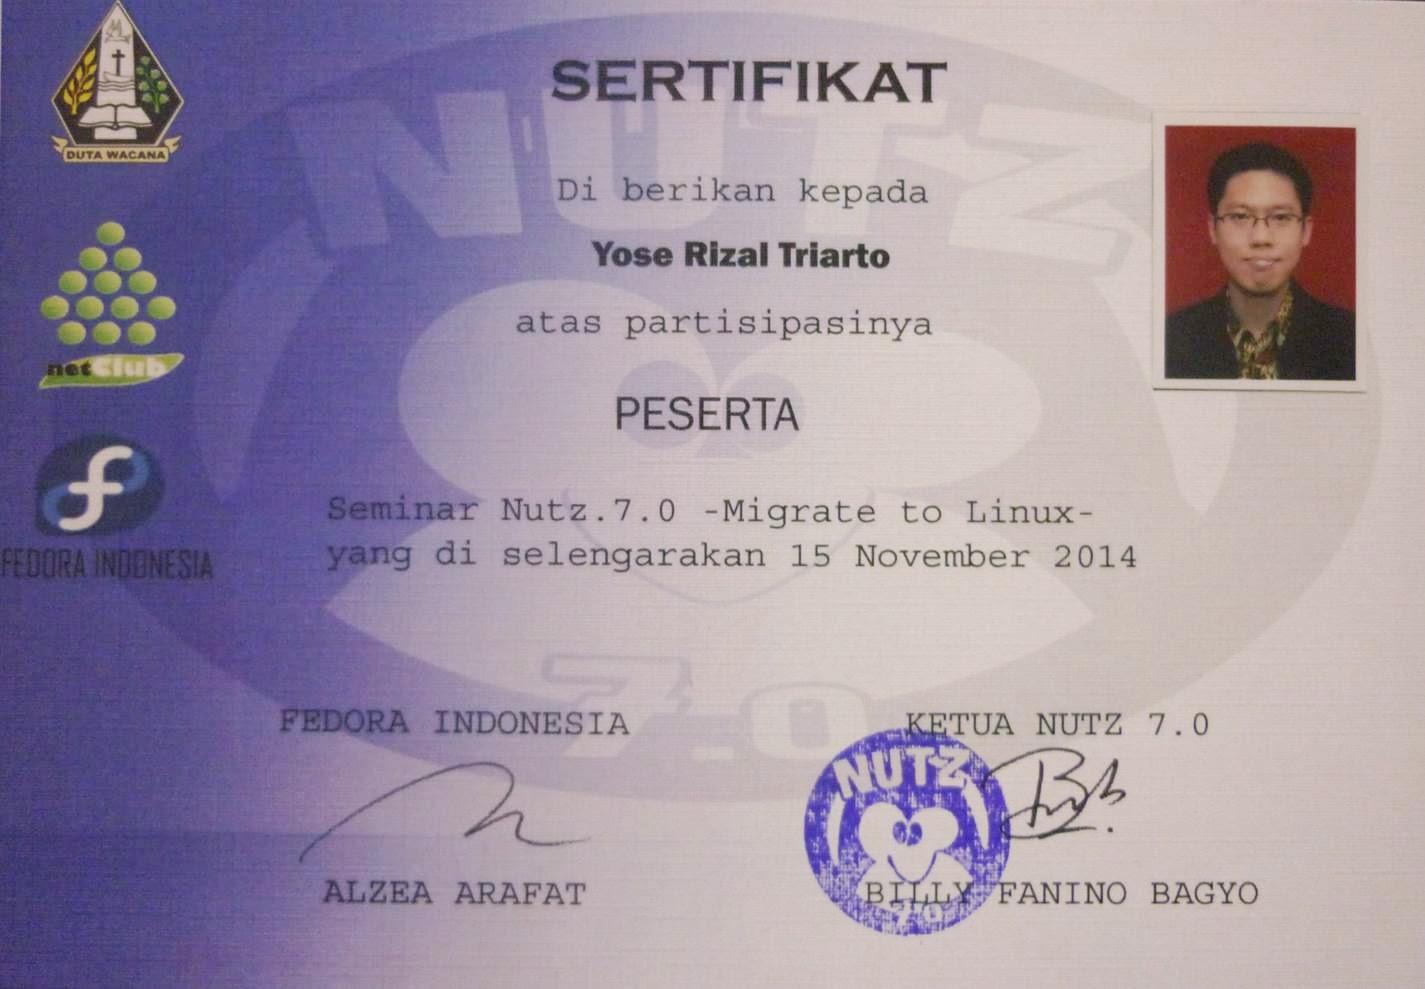 Seminar Nutz 7.0 Migrate to Linux UKDW Fedora Indonesia